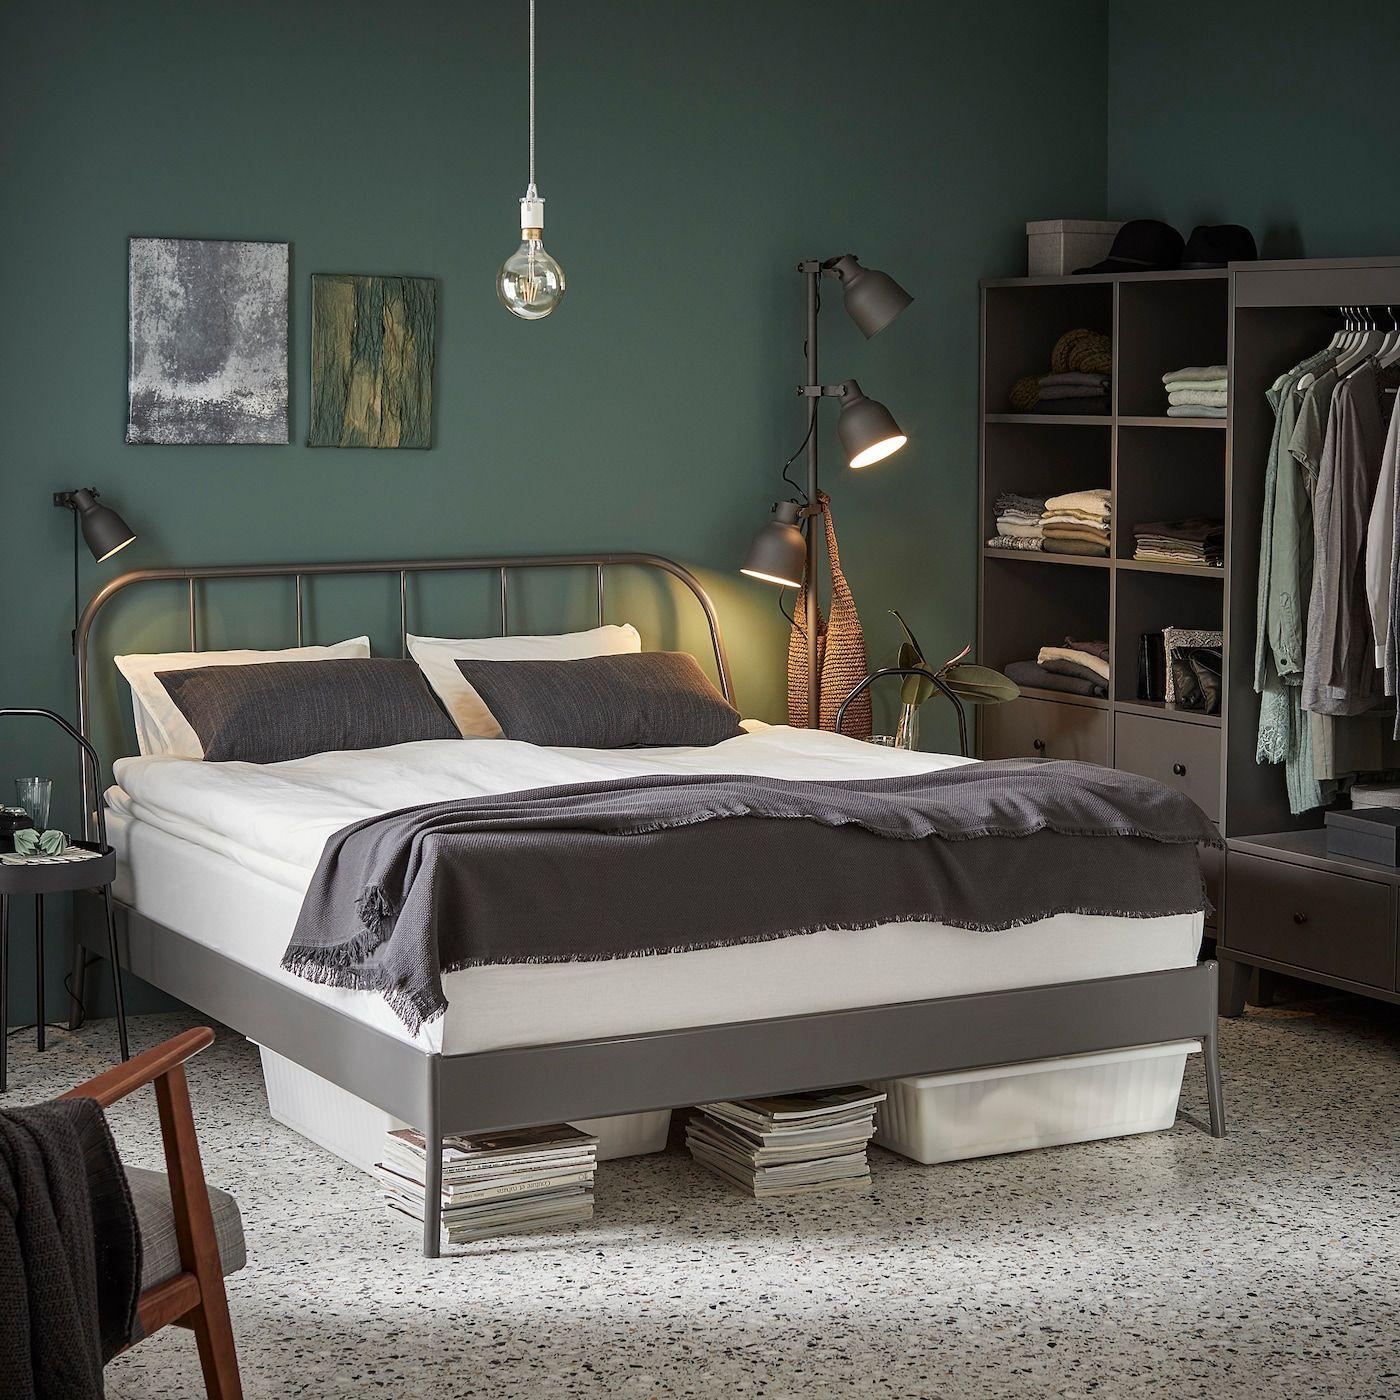 KOPARDAL Rama łóżka szary 160x200 cm Bedframe, Ikea